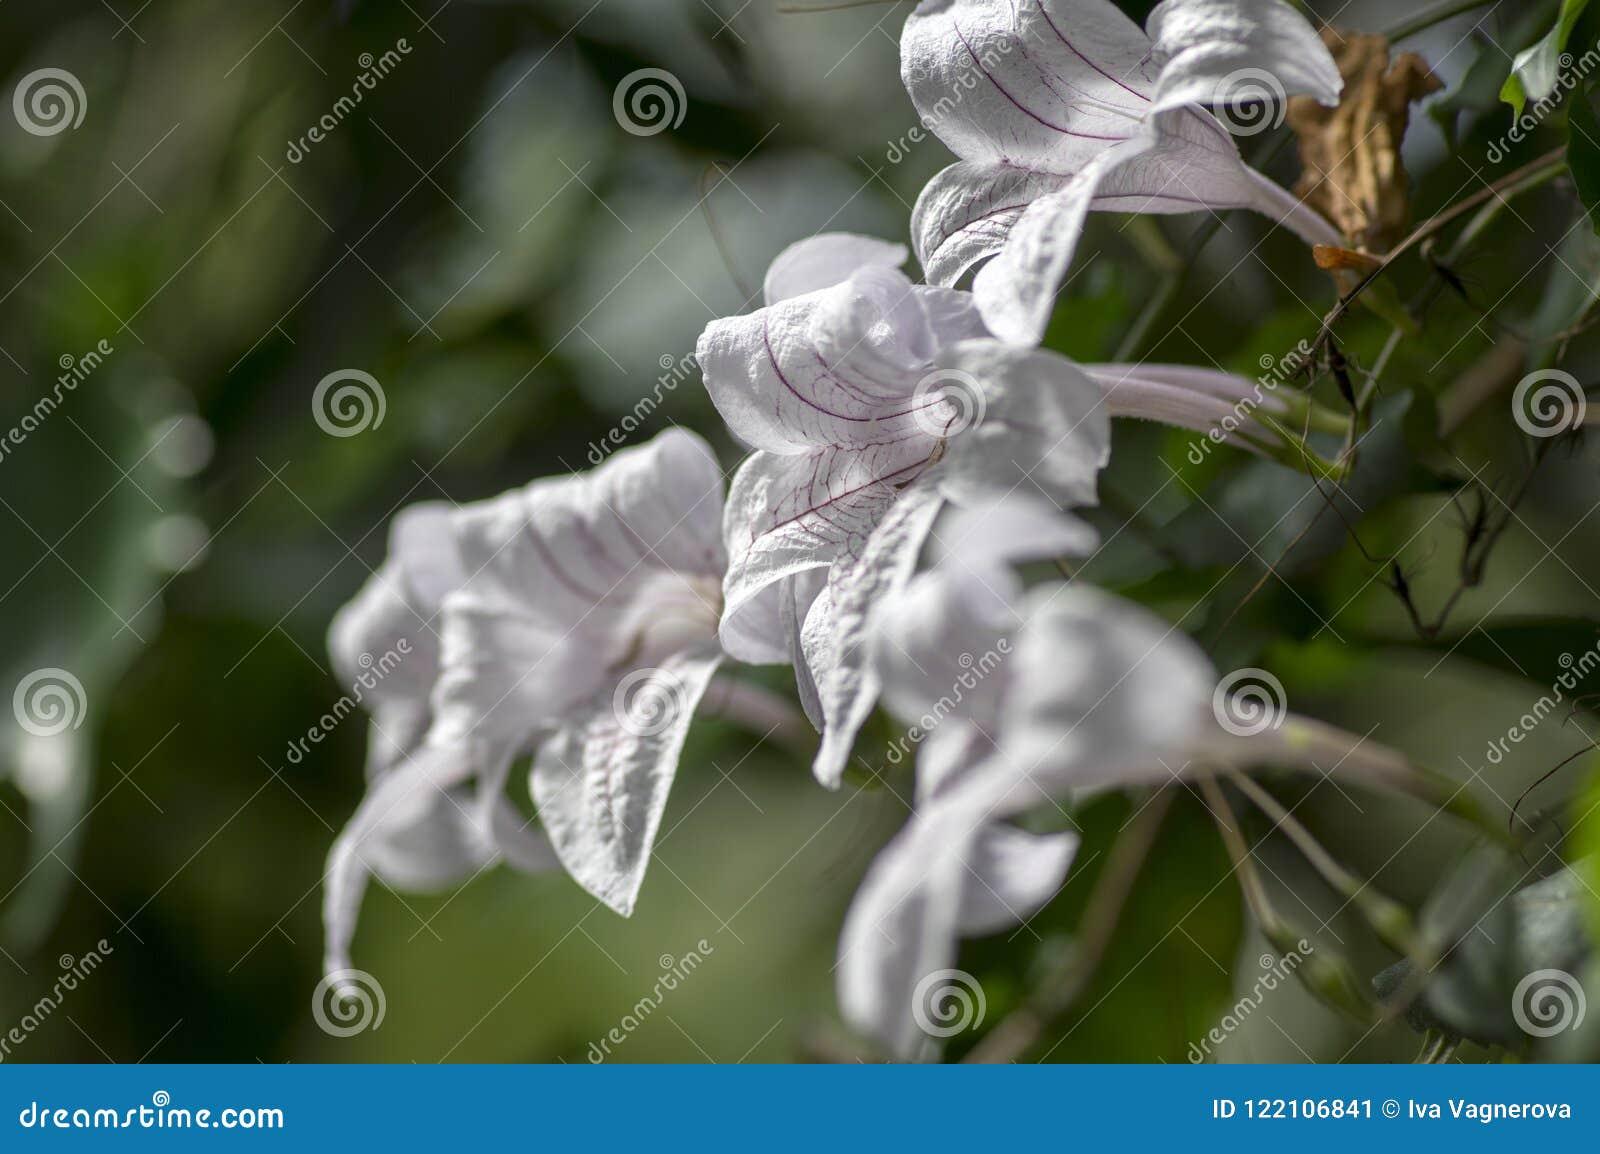 Asystasia Bella Tropical Shrub In Bloom Flowering Plant Amazing